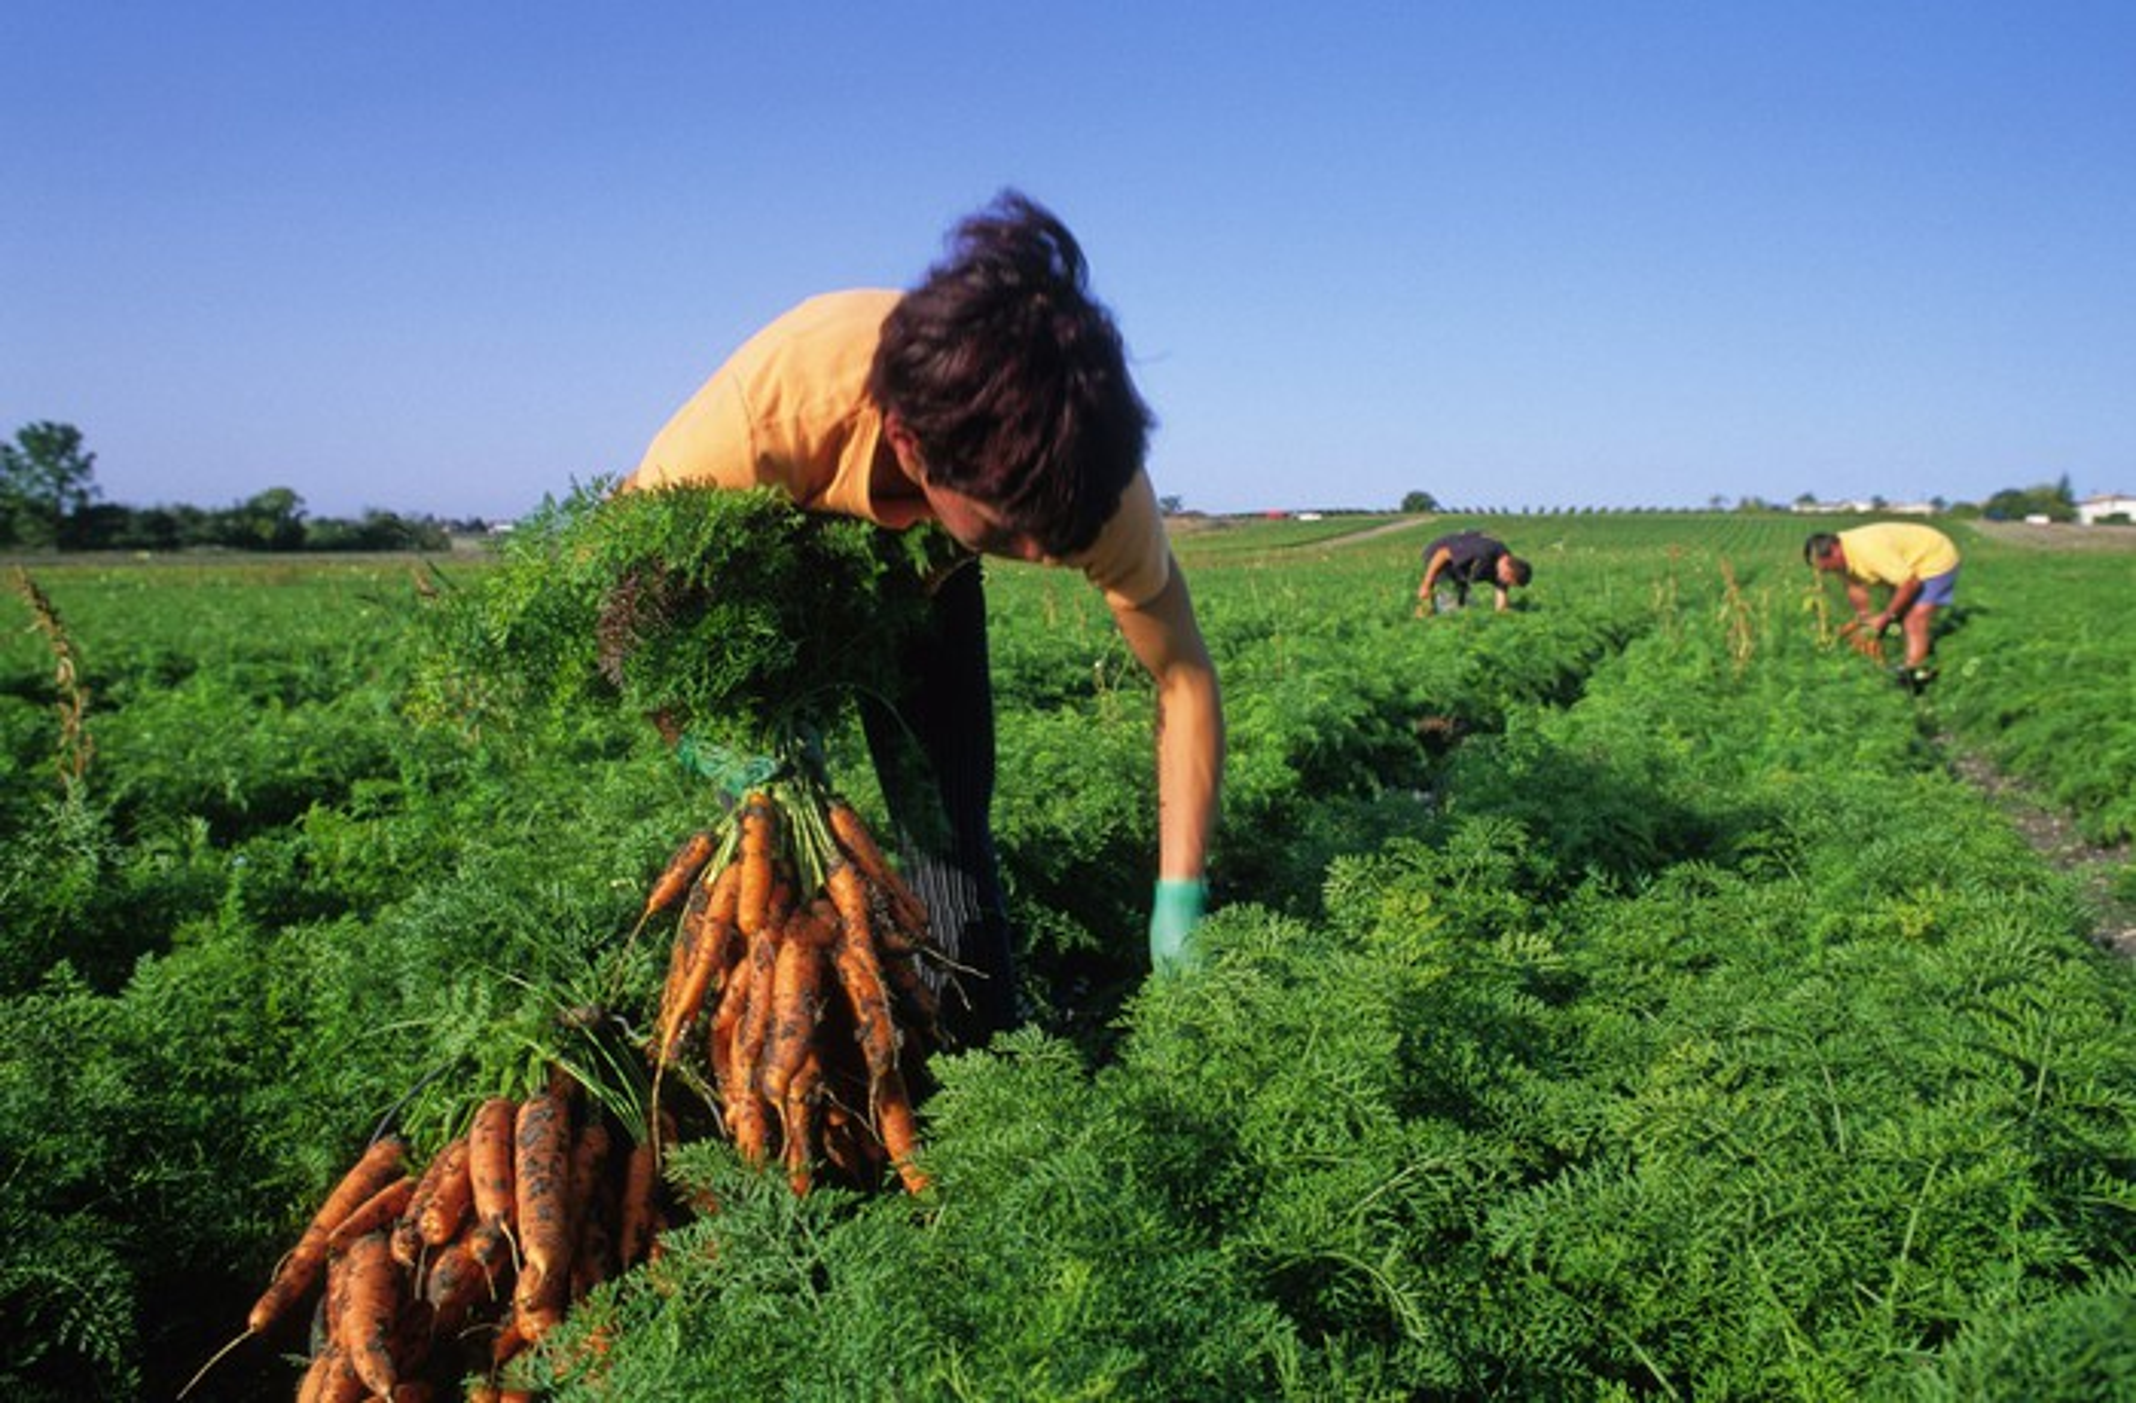 A worker picks carrots on a farm.